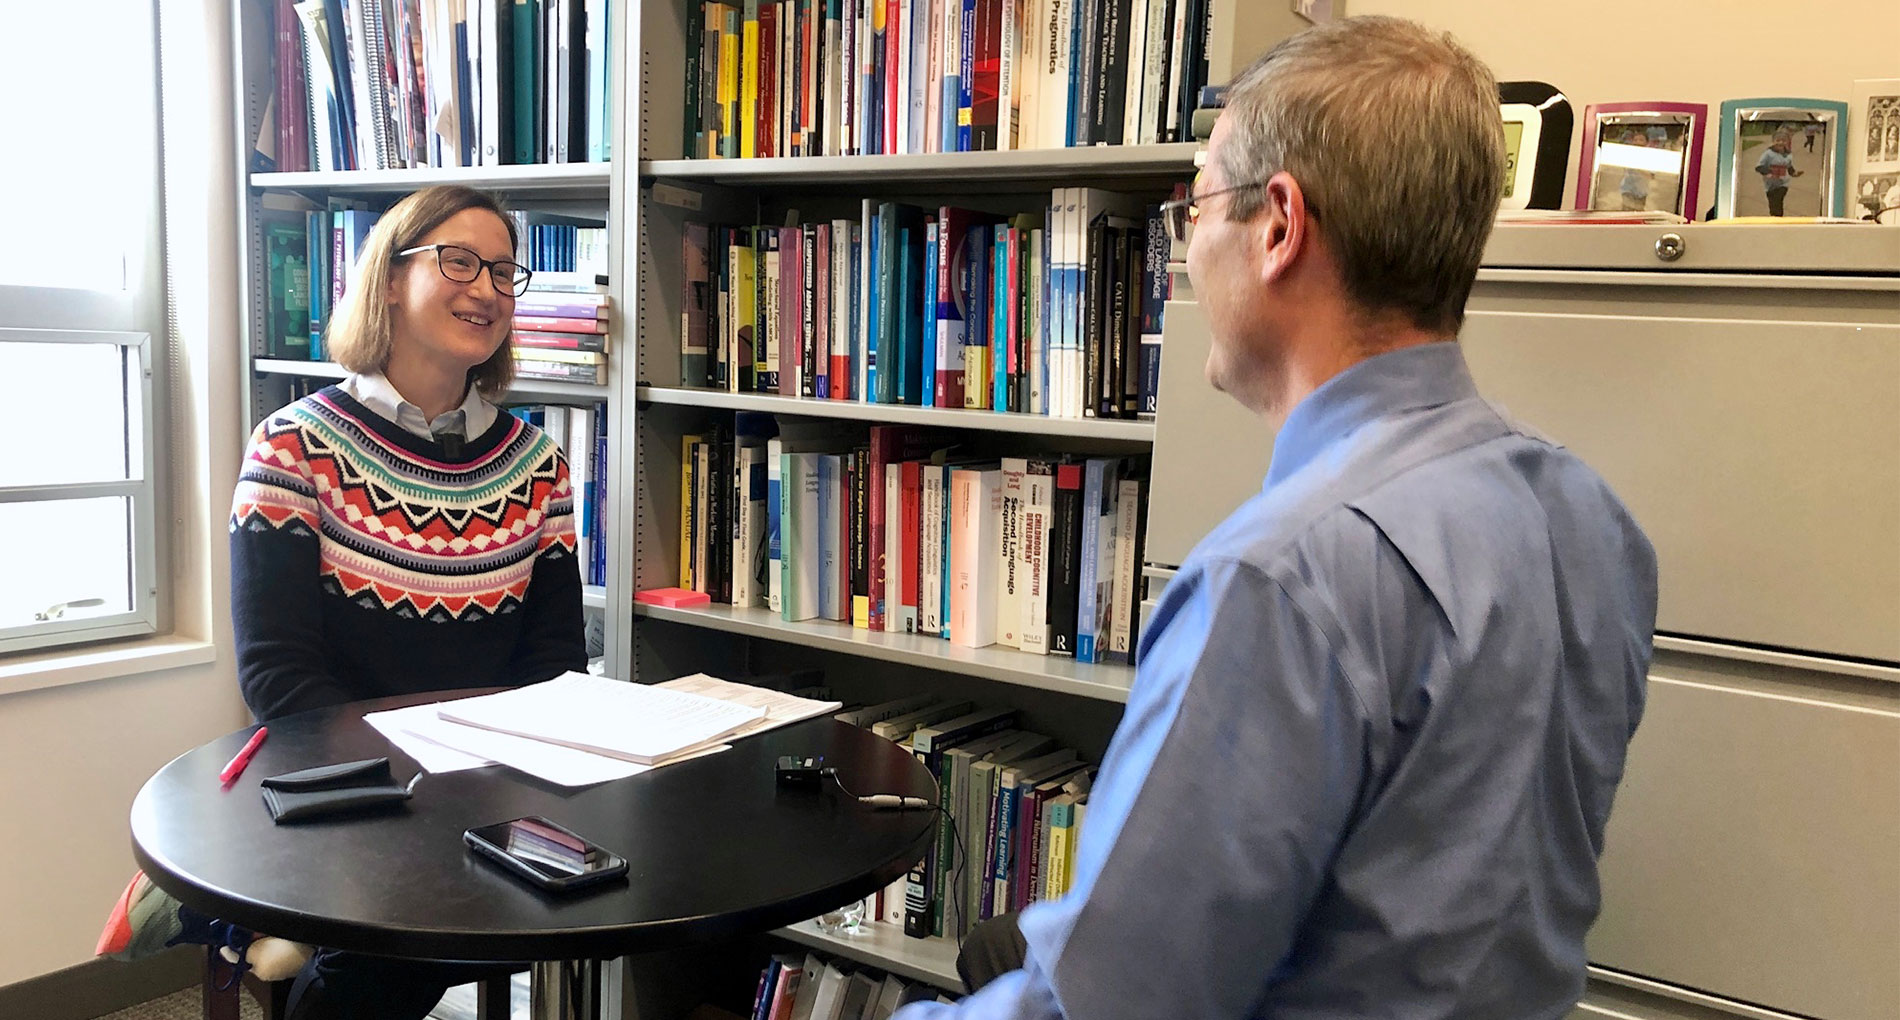 LAE Podcast Hosts Associate Professor of Linguistics Paula Winke